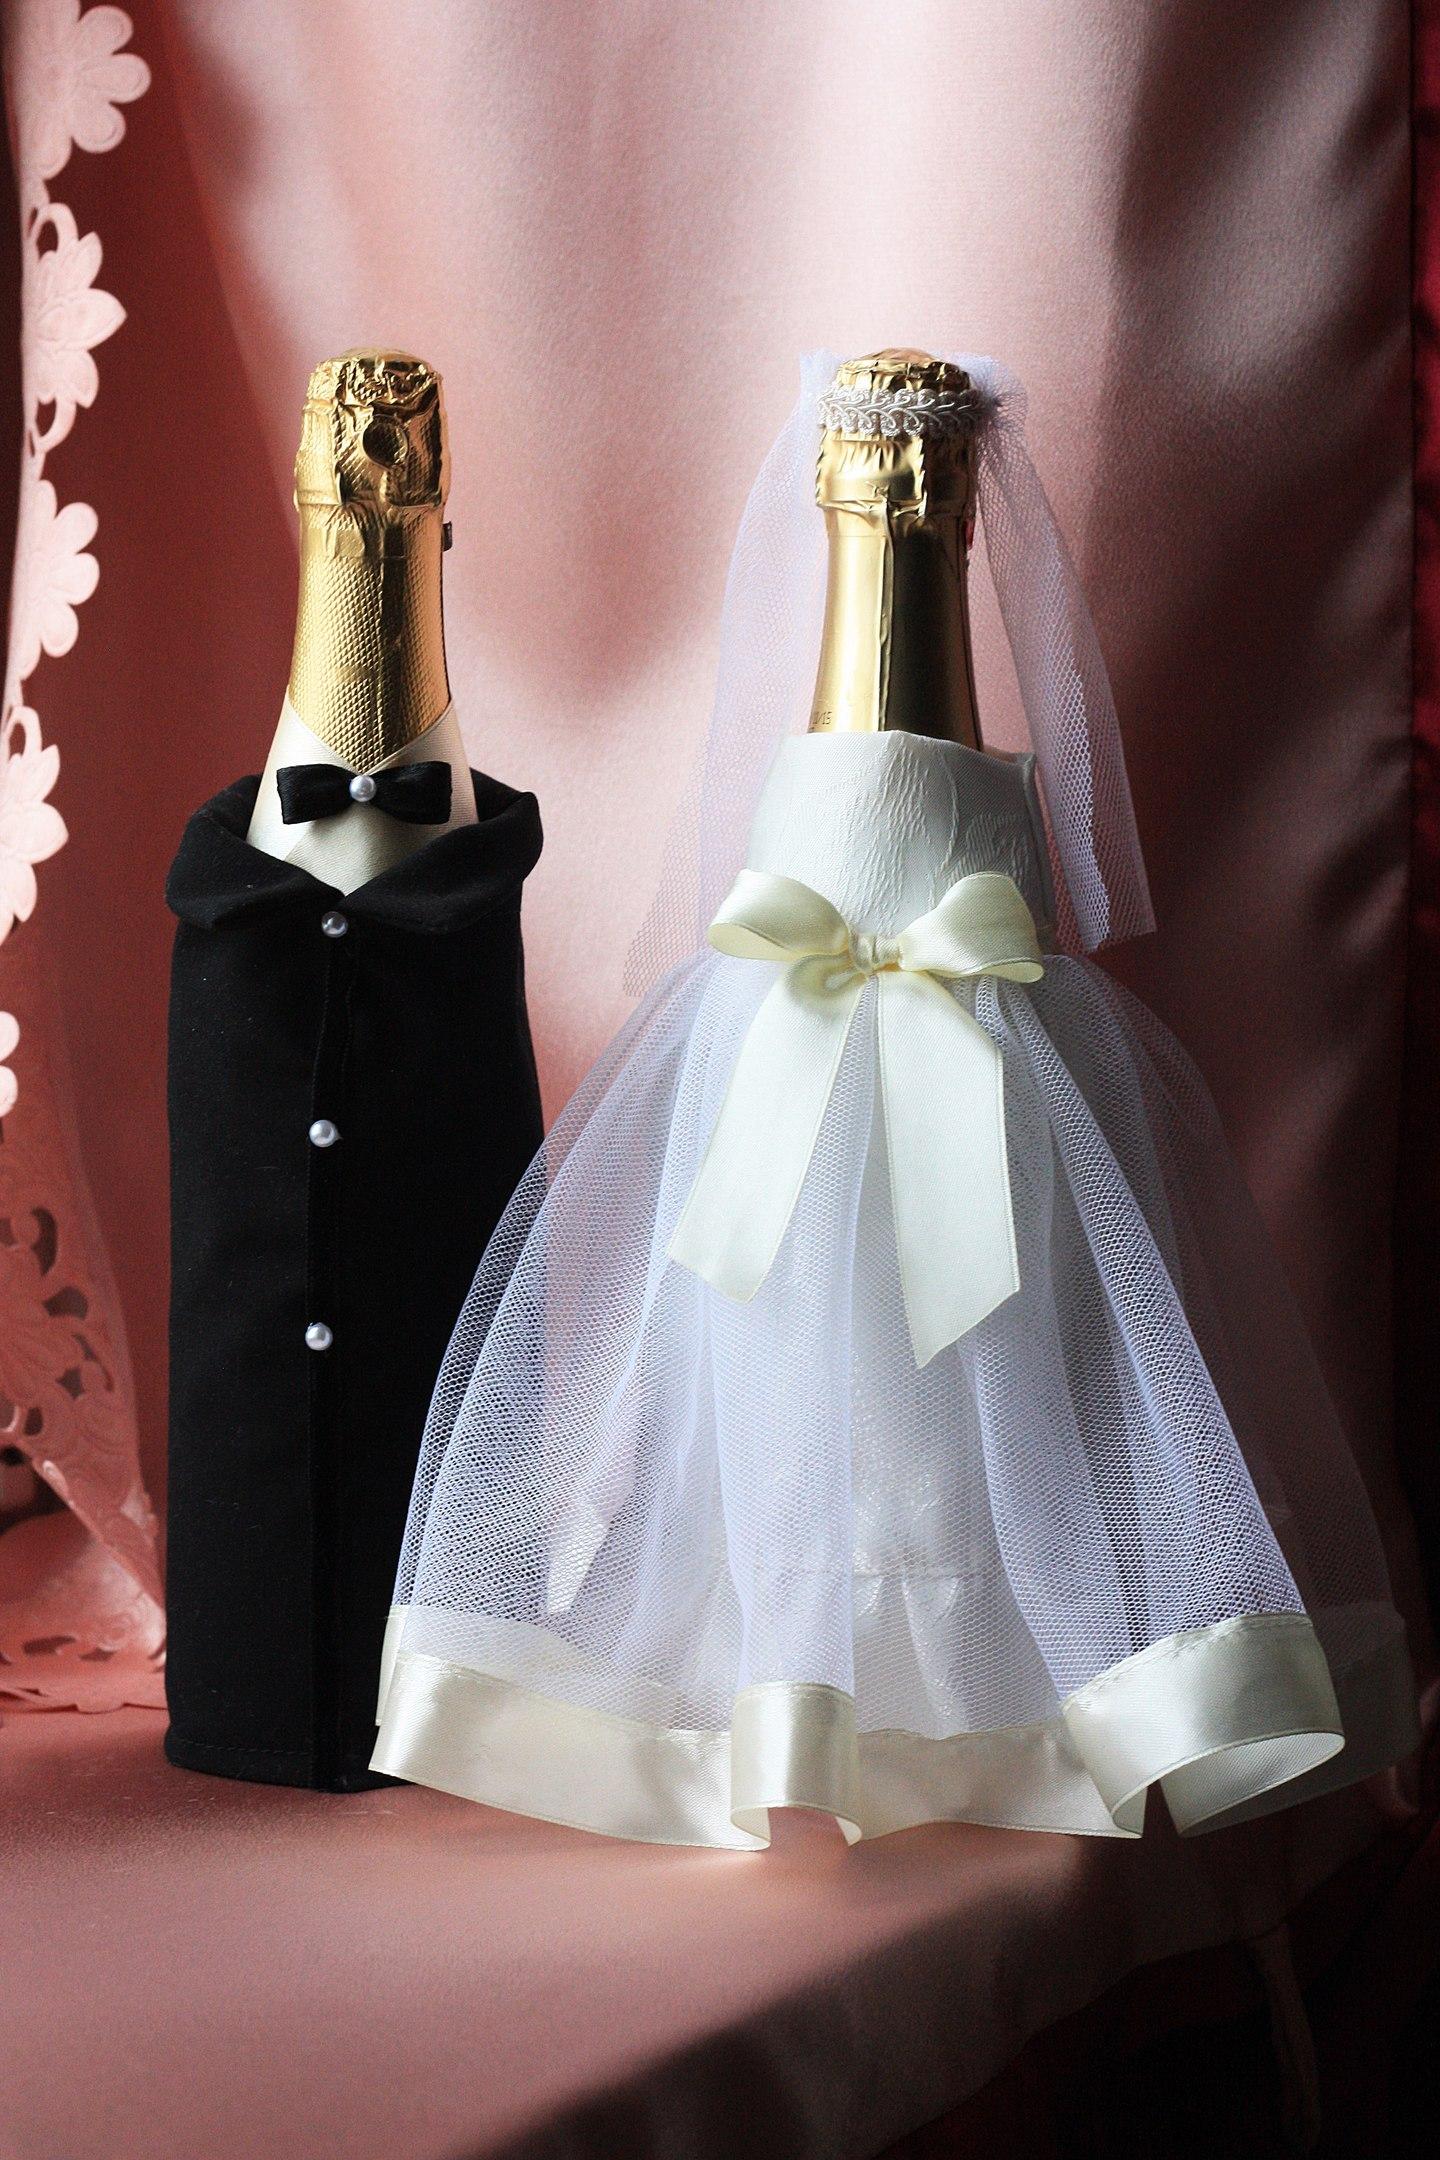 Фото на бутылку вина на свадьбу